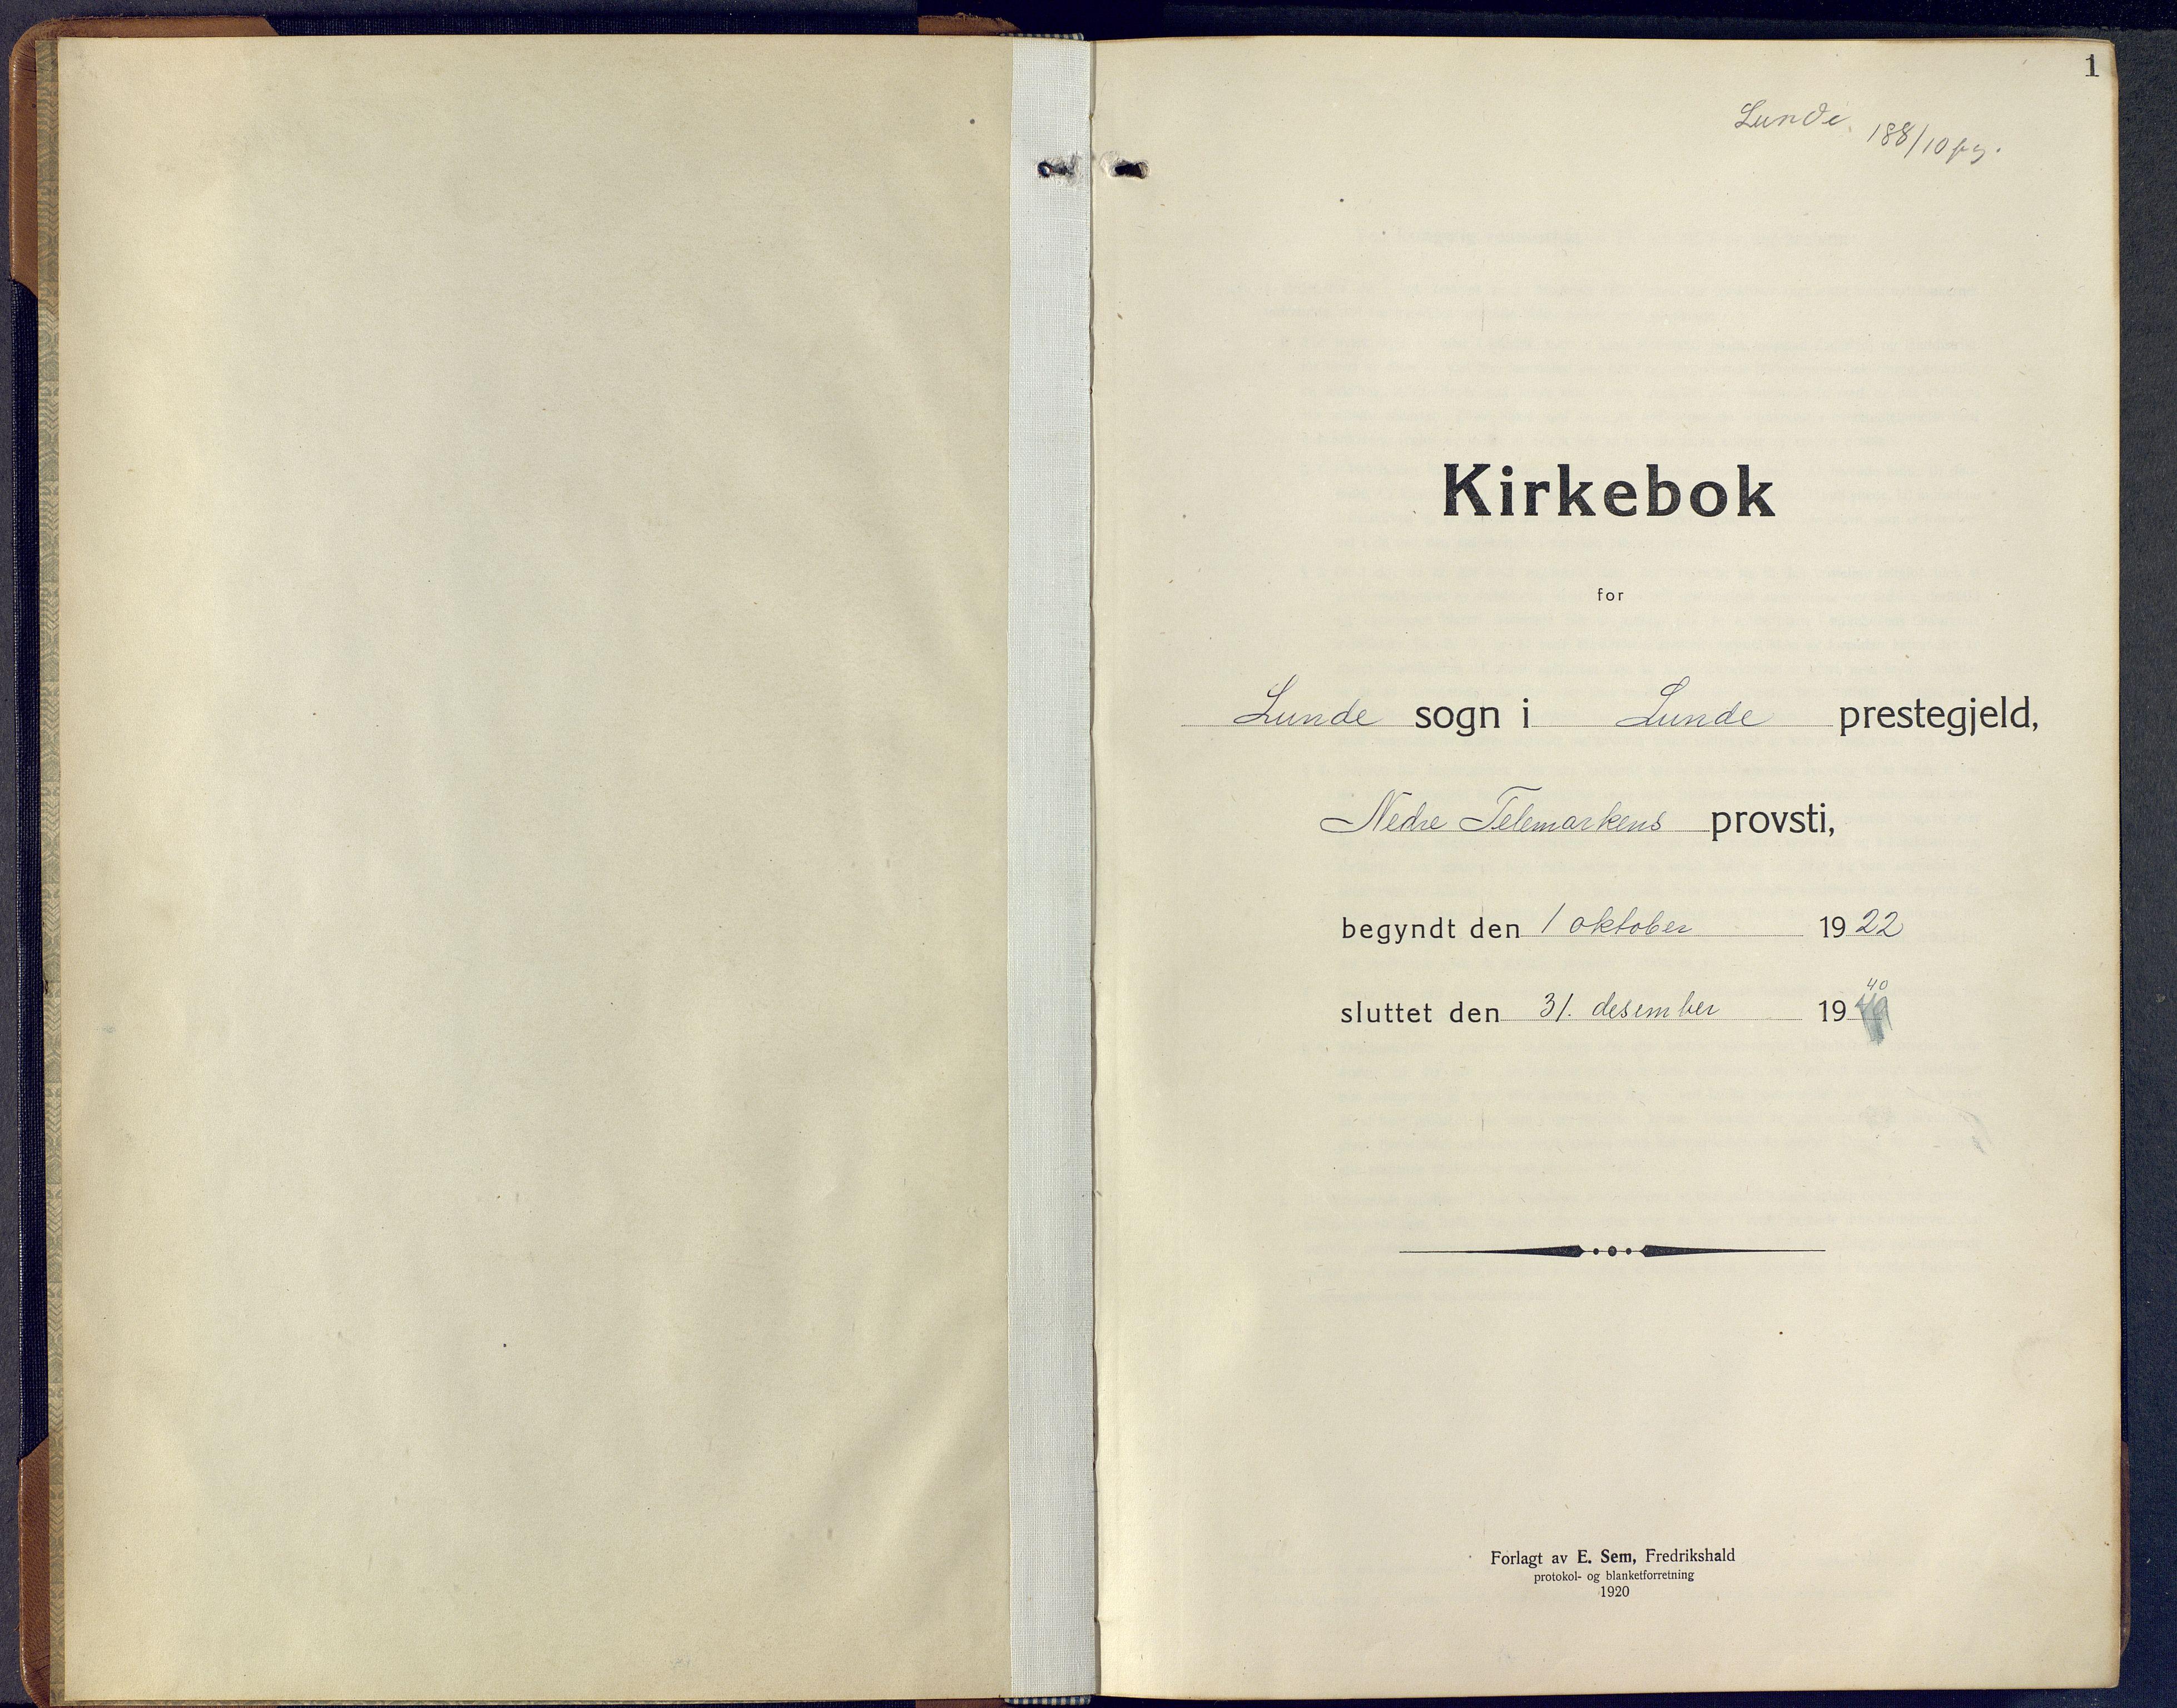 SAKO, Lunde kirkebøker, F/Fa/L0006: Ministerialbok nr. I 6, 1922-1940, s. 1